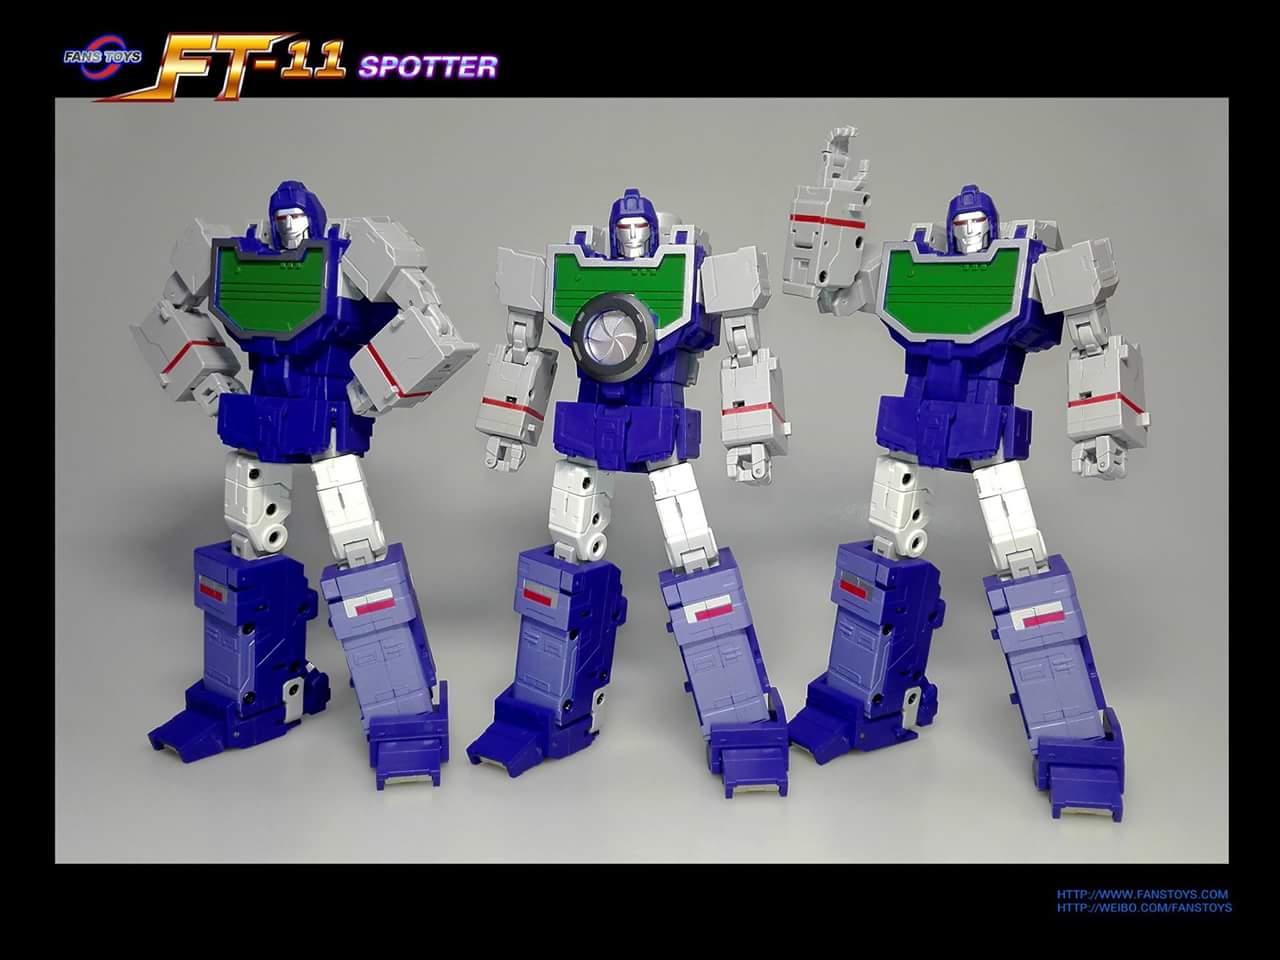 [Fanstoys] Produit Tiers - Jouet FT-11 Spotter - aka Reflector/Réflecteur UHBRV2Tt